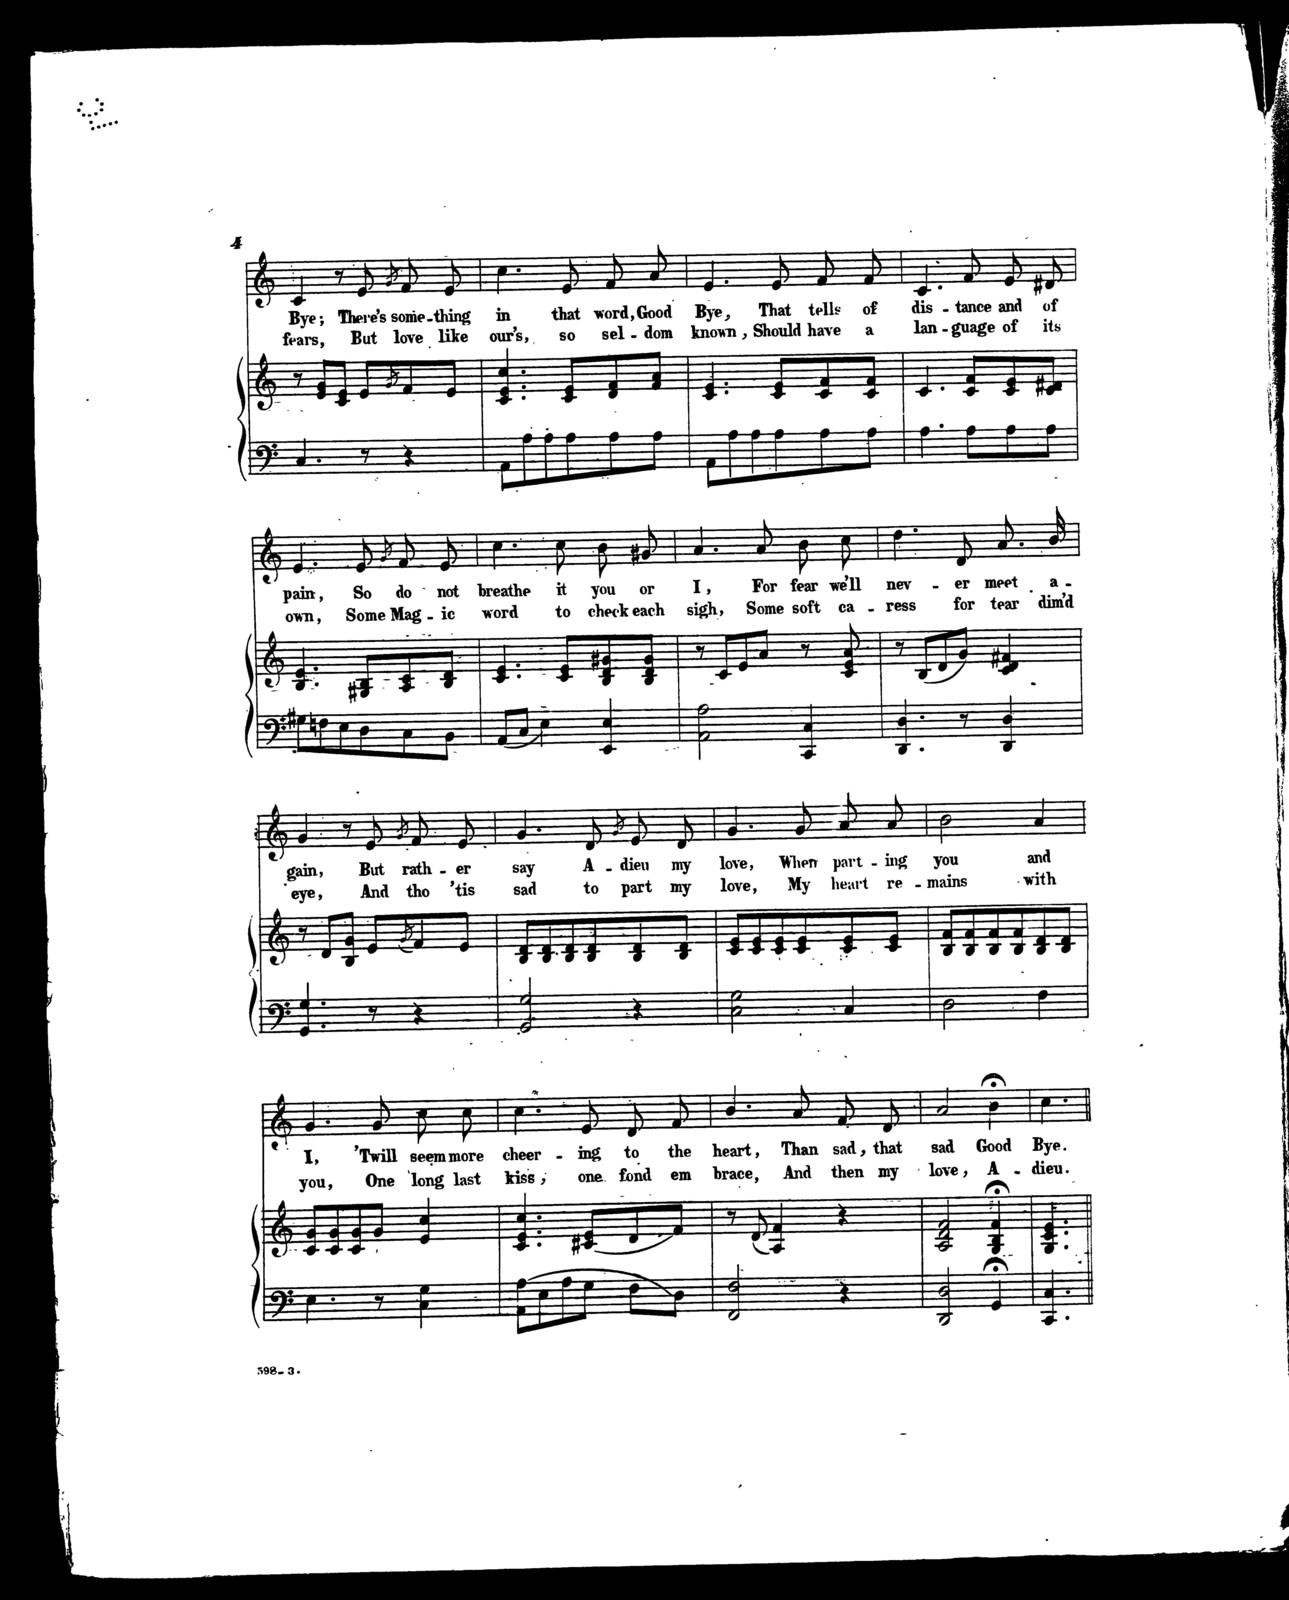 If we must part; Ballad